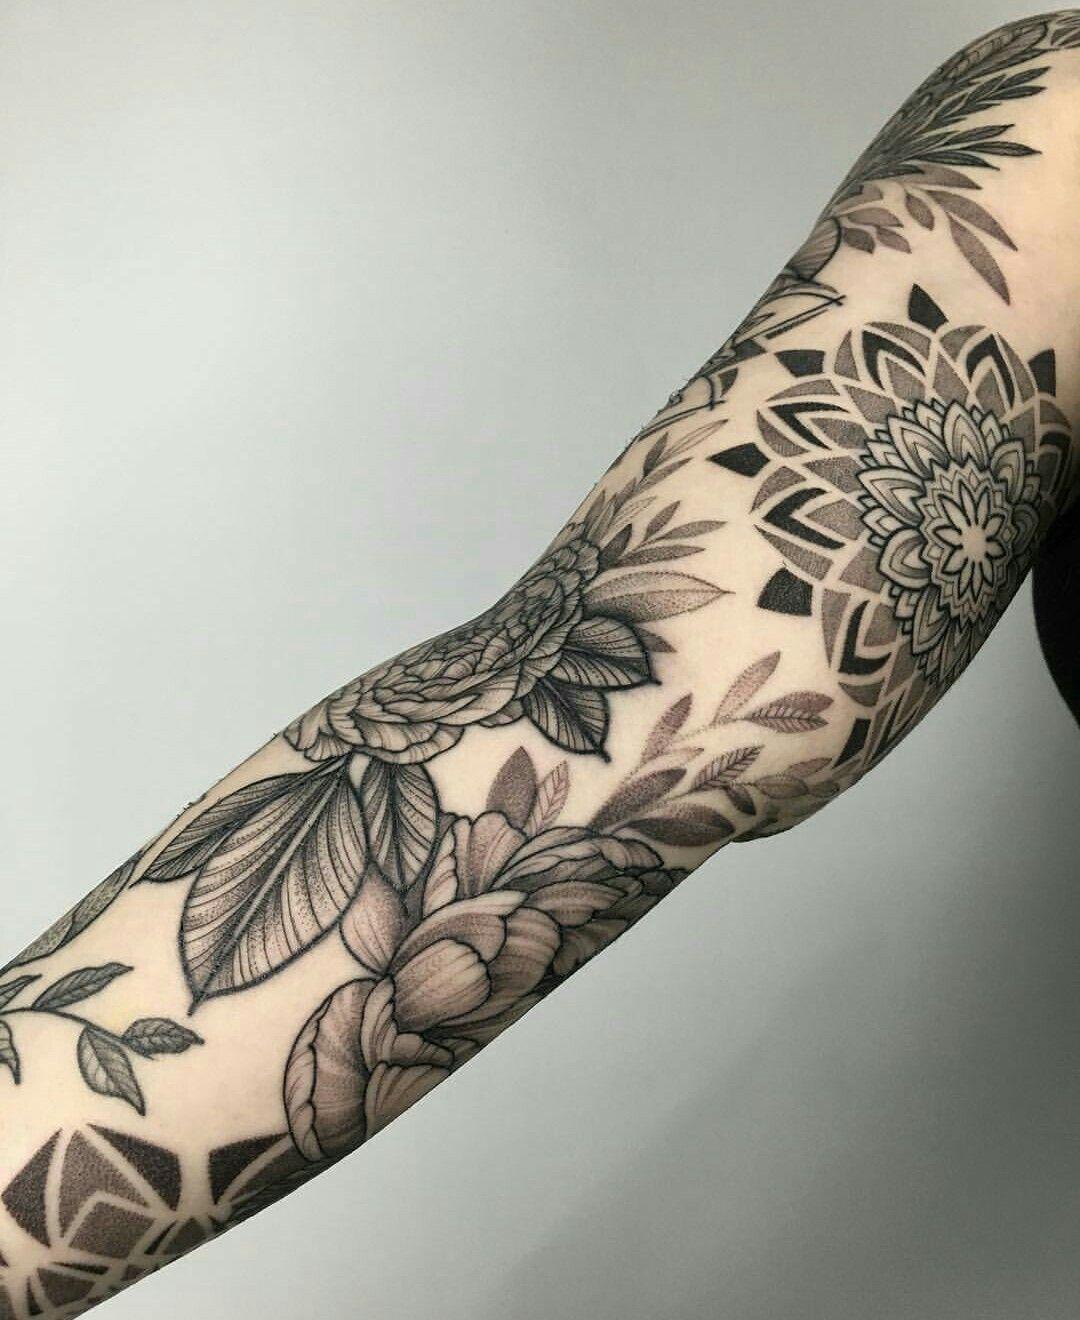 Pin By Arien Grosskurth On I N K Sleeve Tattoos For Women Mandela Tattoo Best Sleeve Tattoos